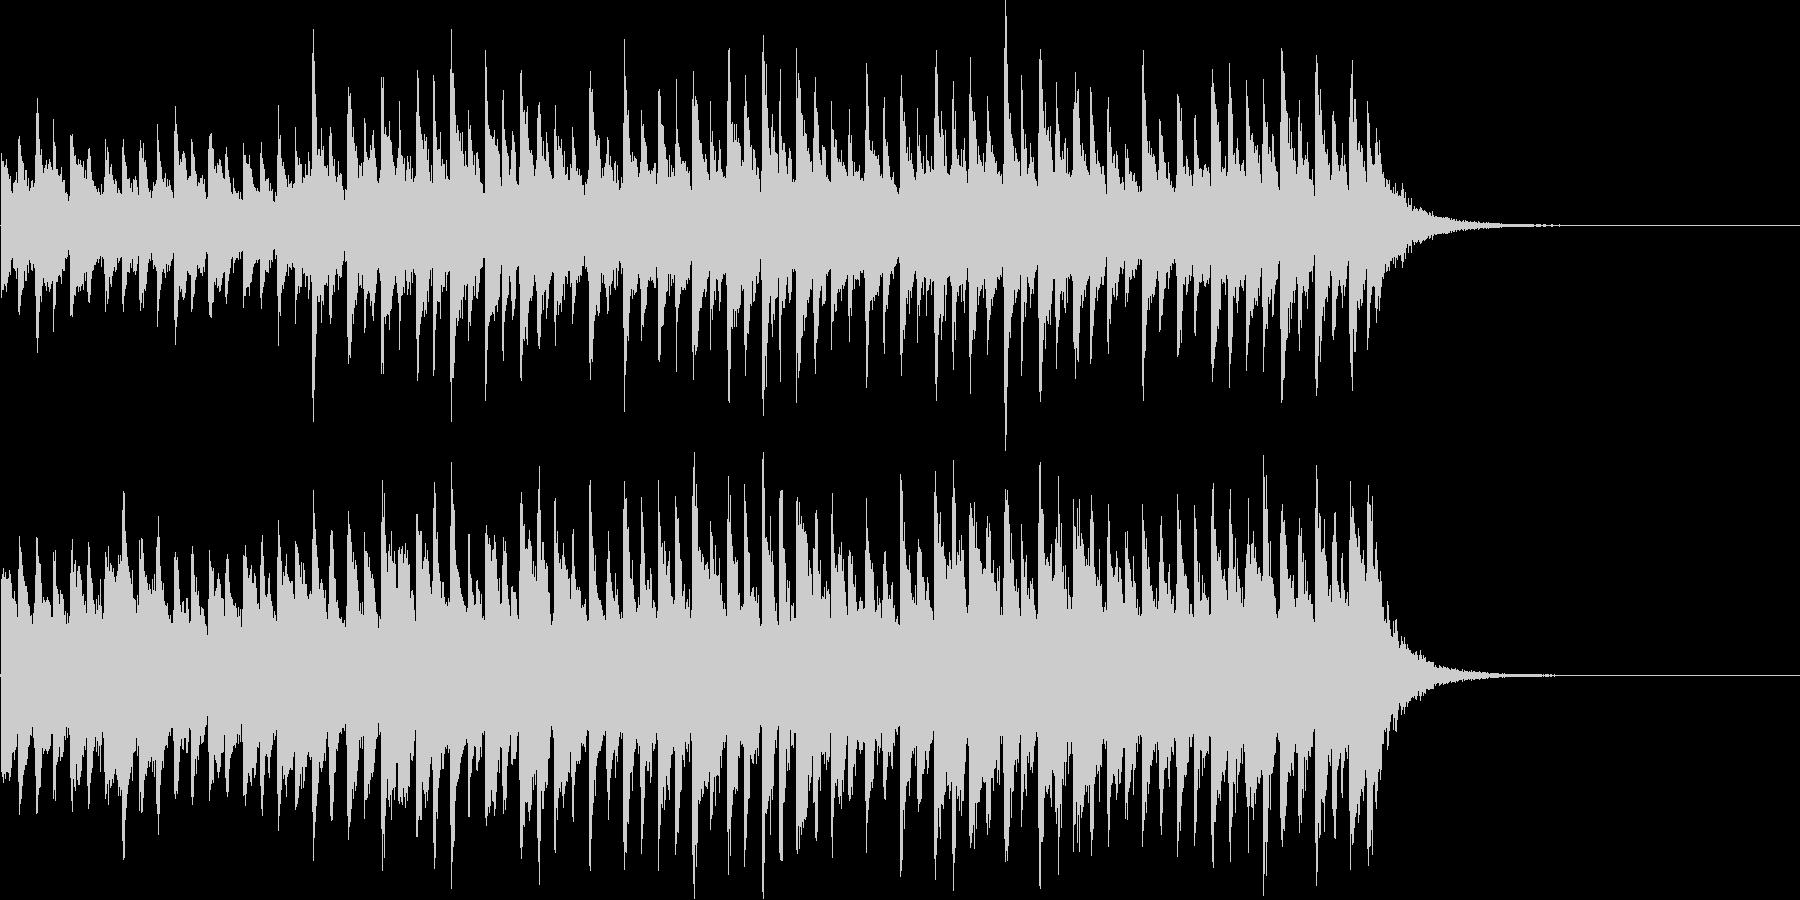 creo_leo_bgm18の未再生の波形